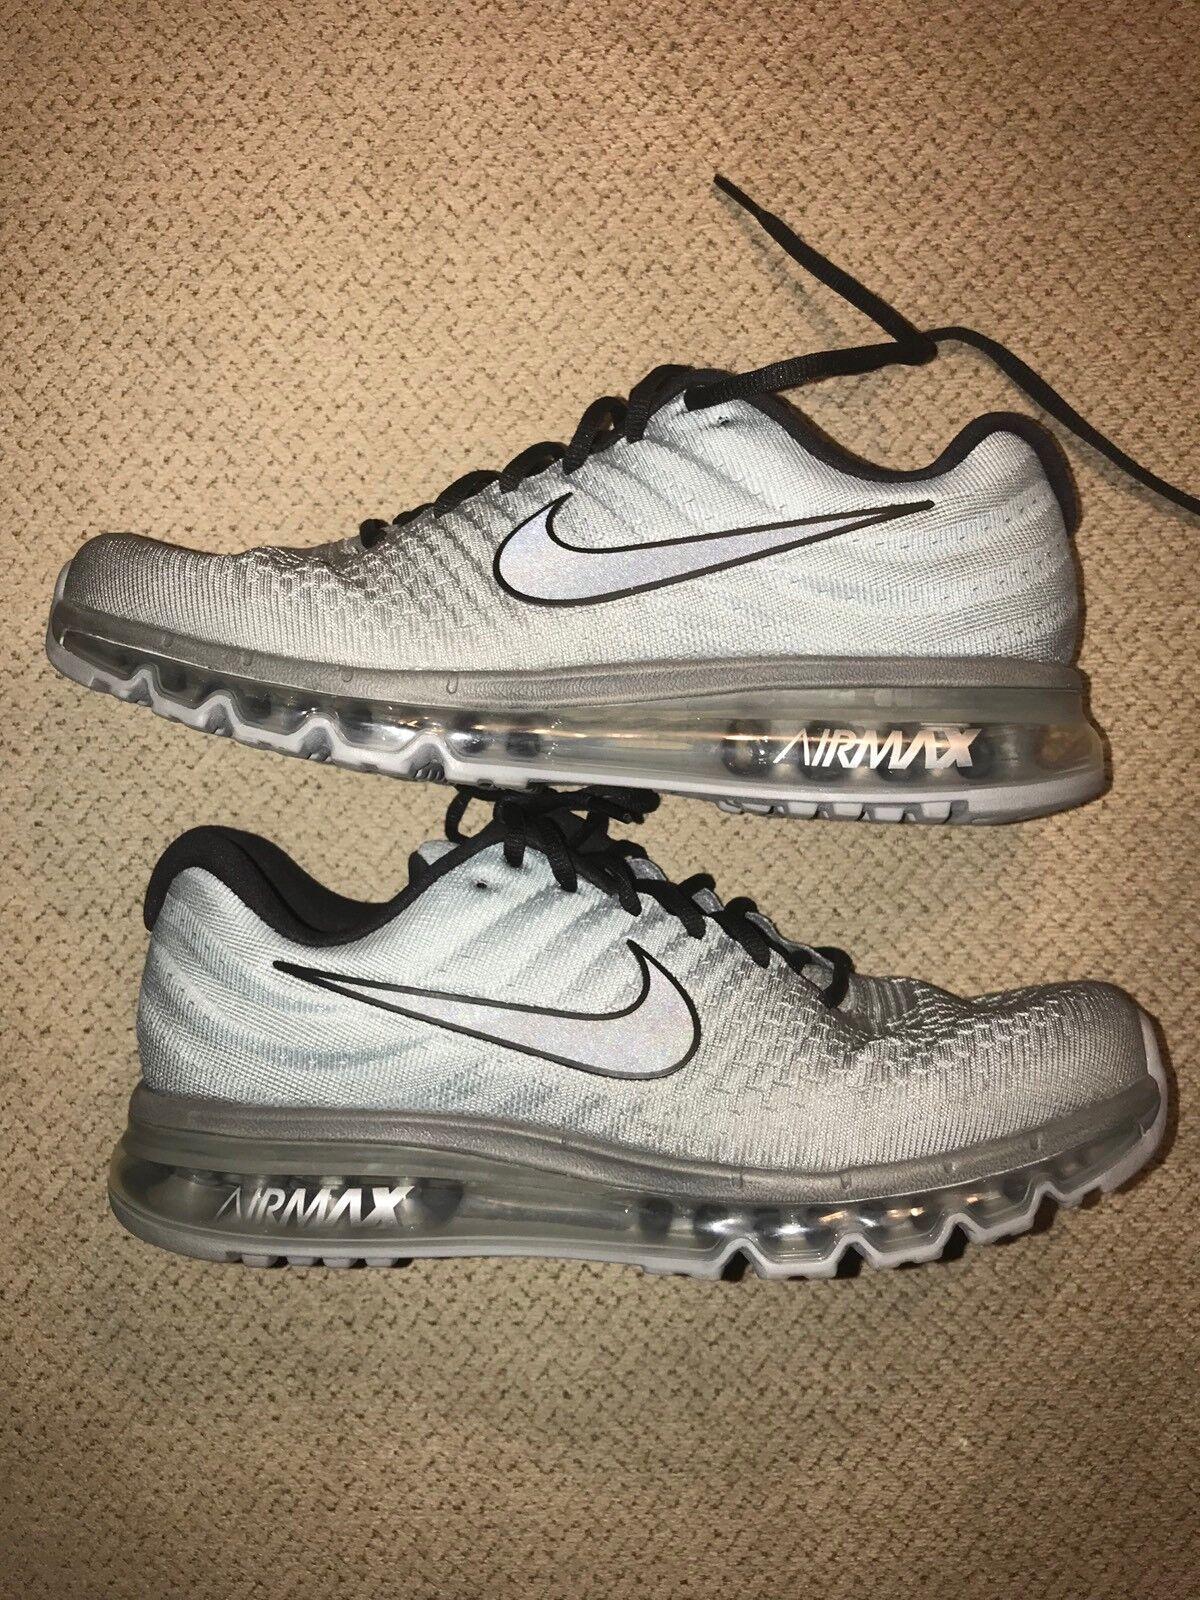 Men's 11 Nike Air Max Tumbled Grey BlackStealth [849559  003] Running